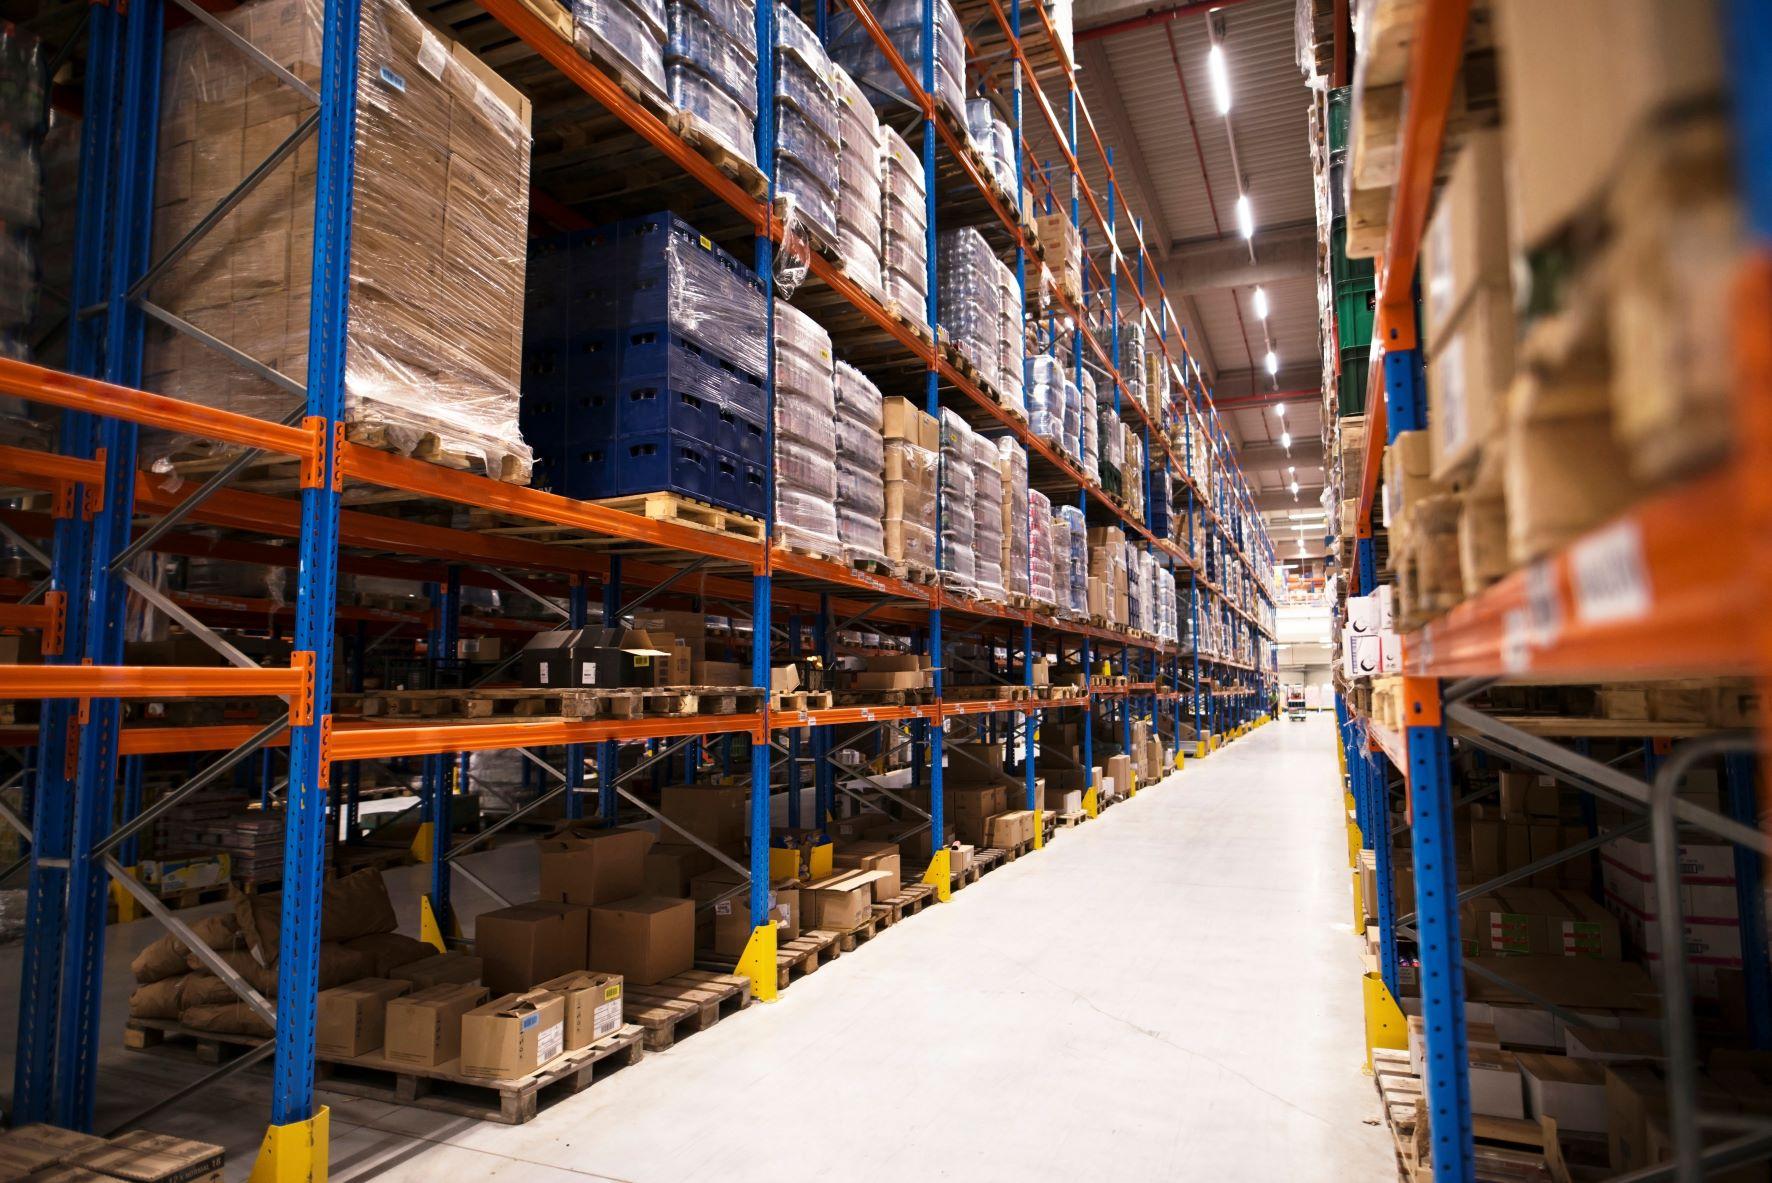 E-Commerce Speeds Up Warehousing Services